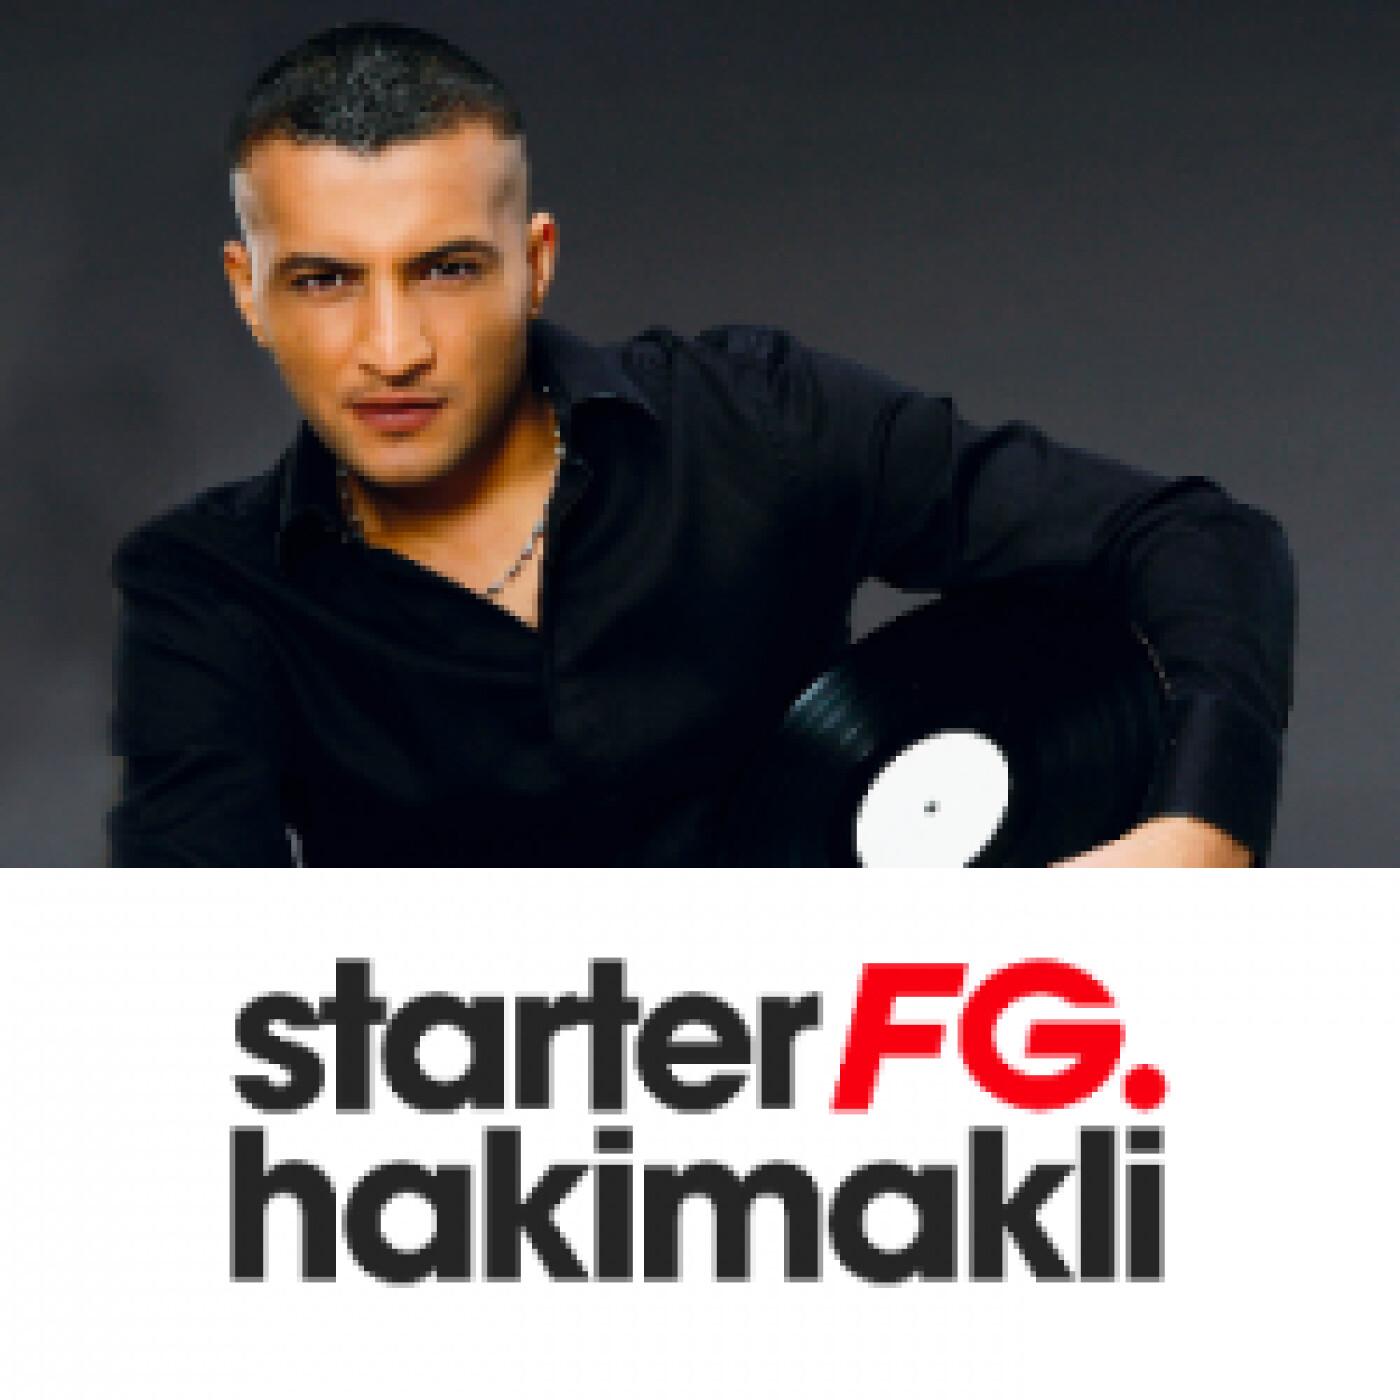 STARTER FG BY HAKIMAKLI JEUDI 27 MAI 2021